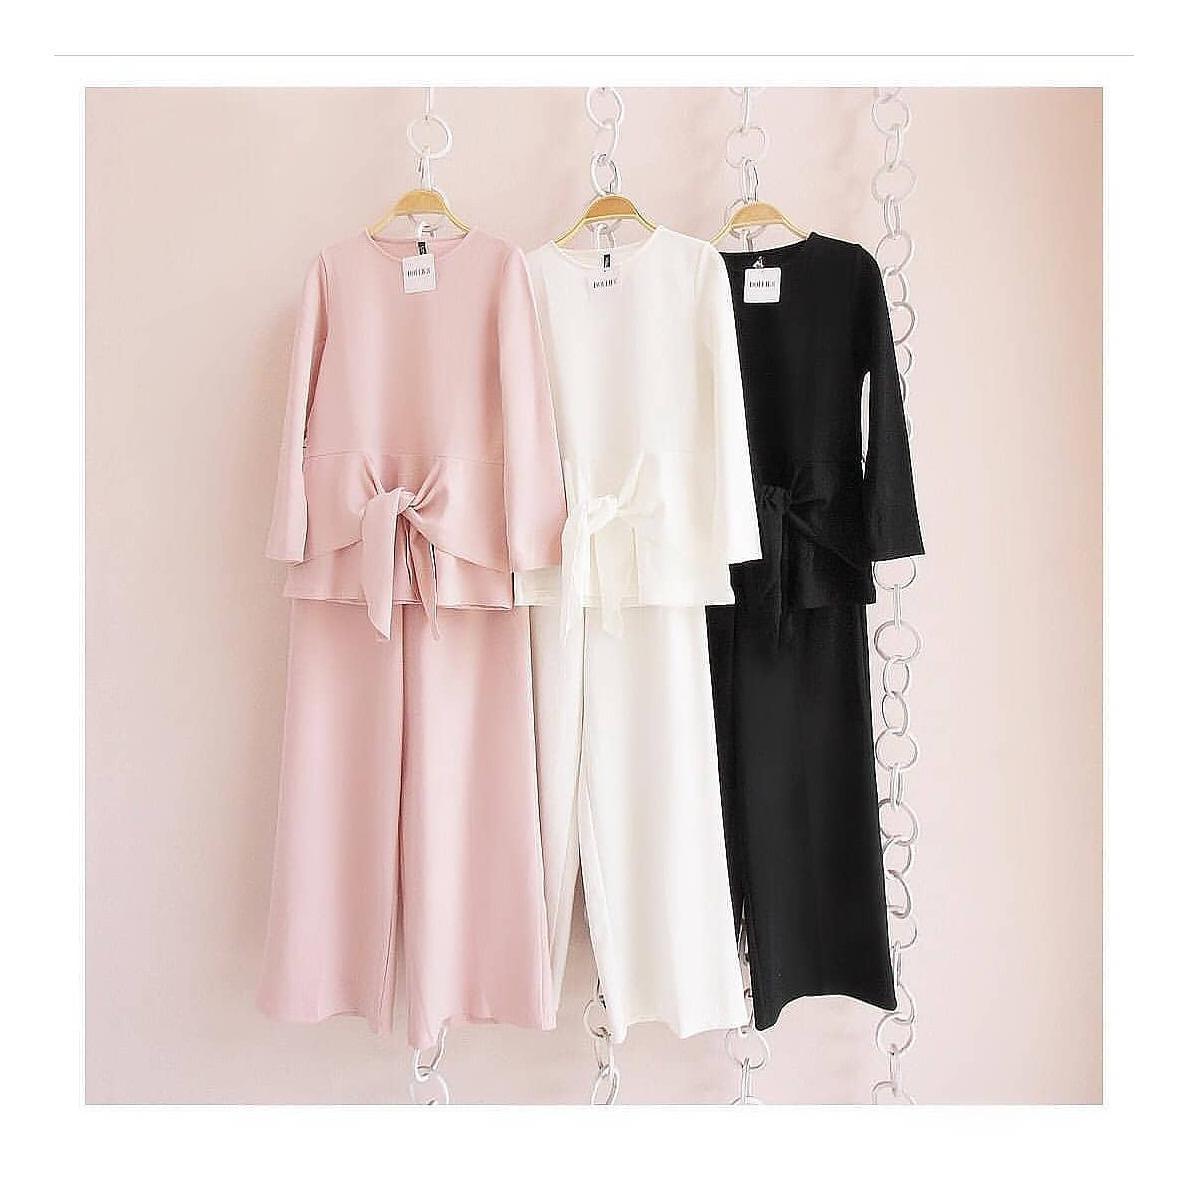 "Stelan Jumpsuite ""SF MARISTA SET""  Baju Panjang Muslim Hijab Moderen Pakaian Trand Baru 2018"